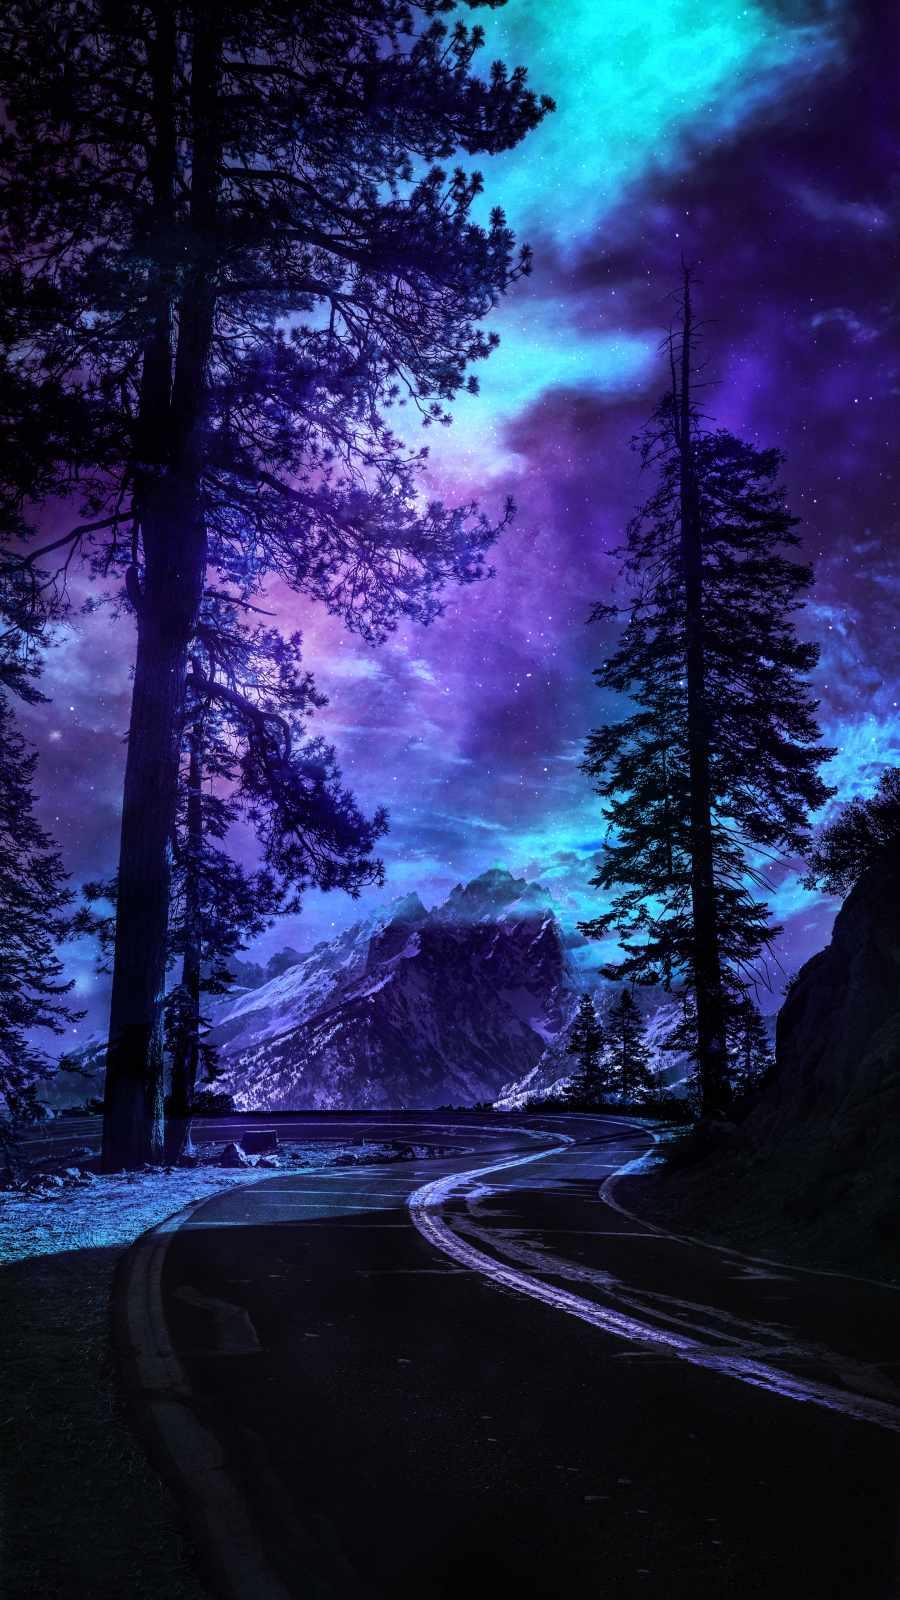 Yosemite National Park Road Night Sky - IPhone Wallpapers